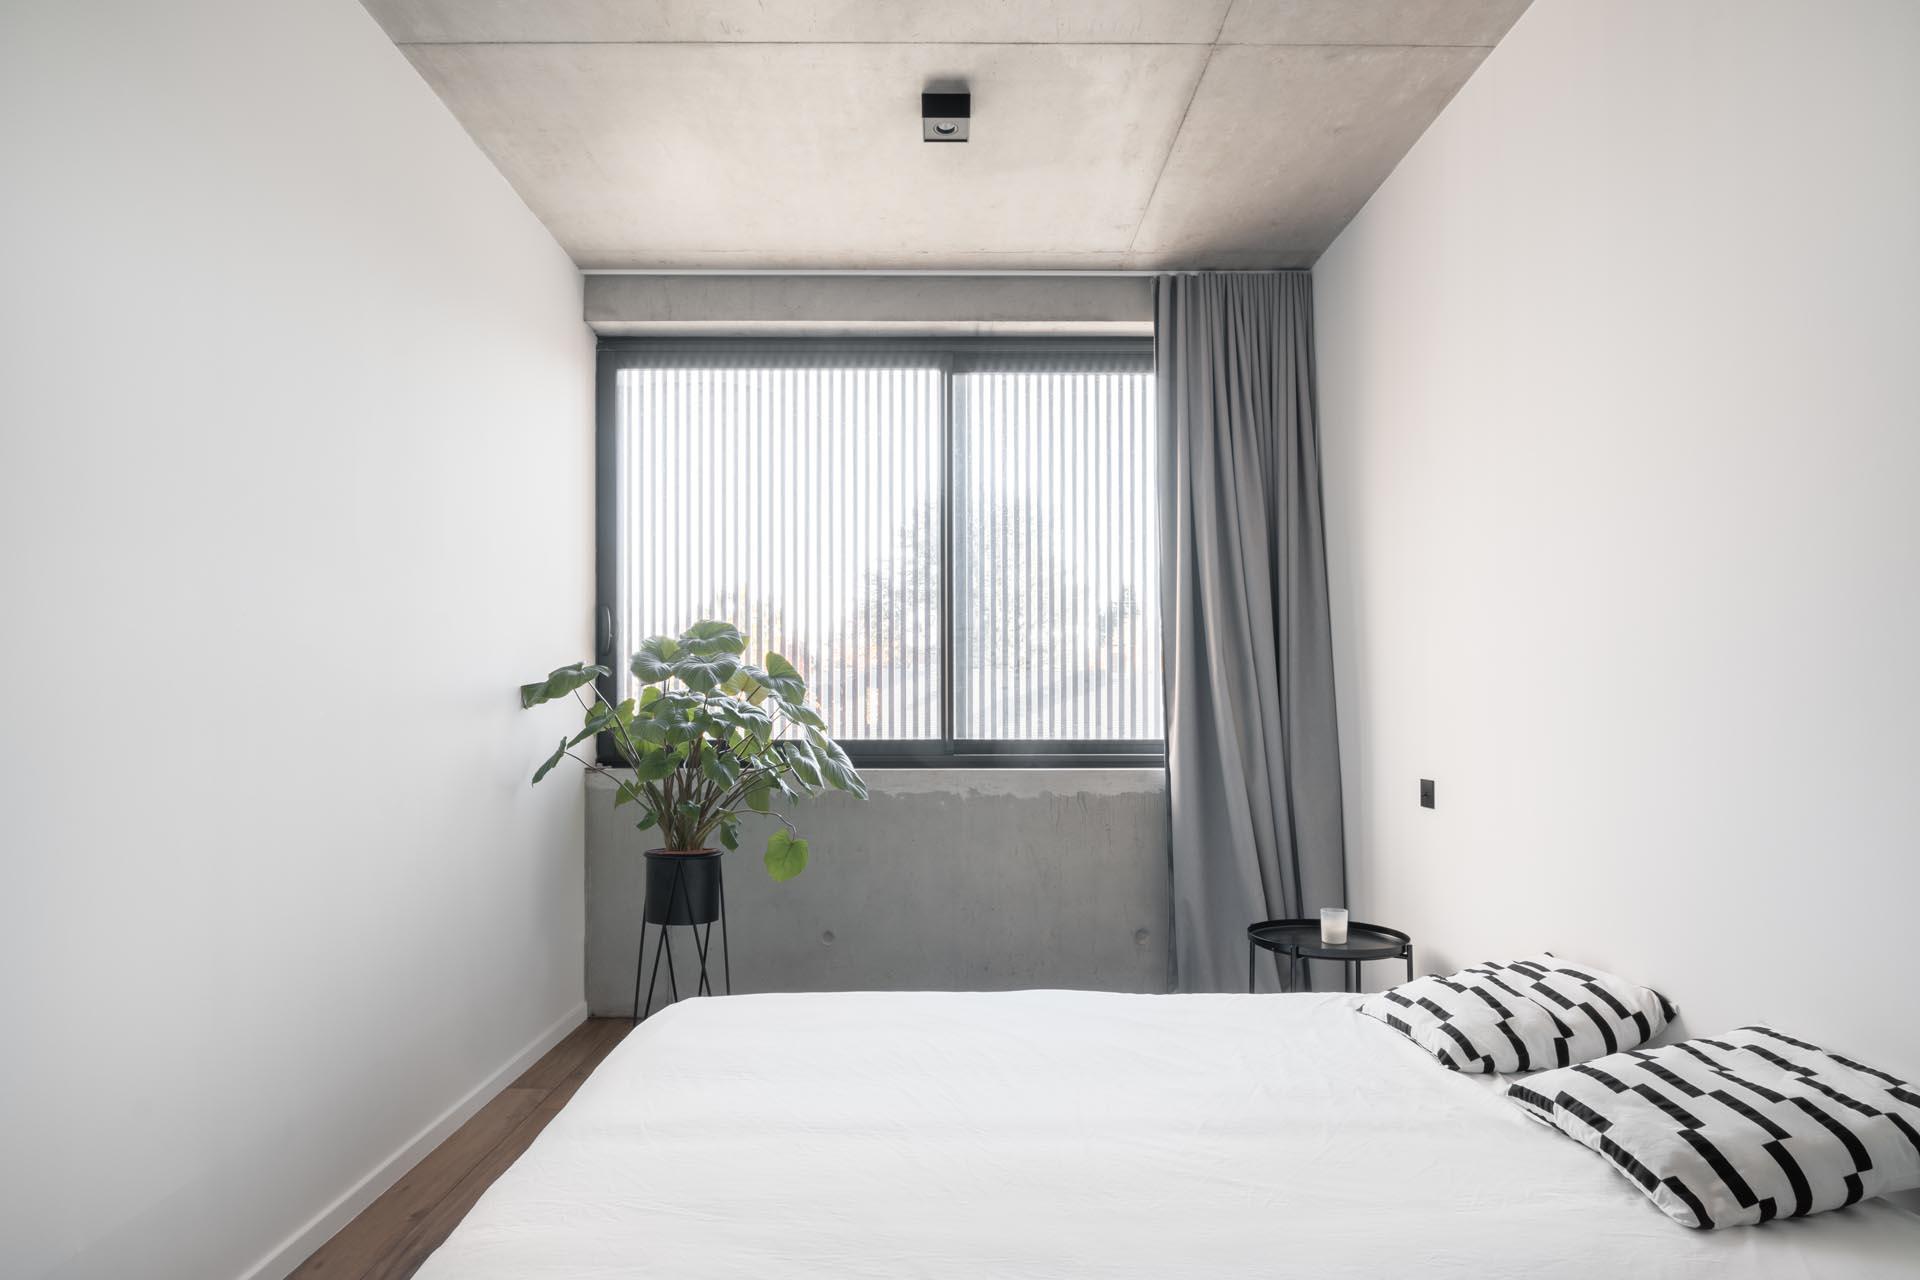 A modern bedroom with minimalist furnishings.